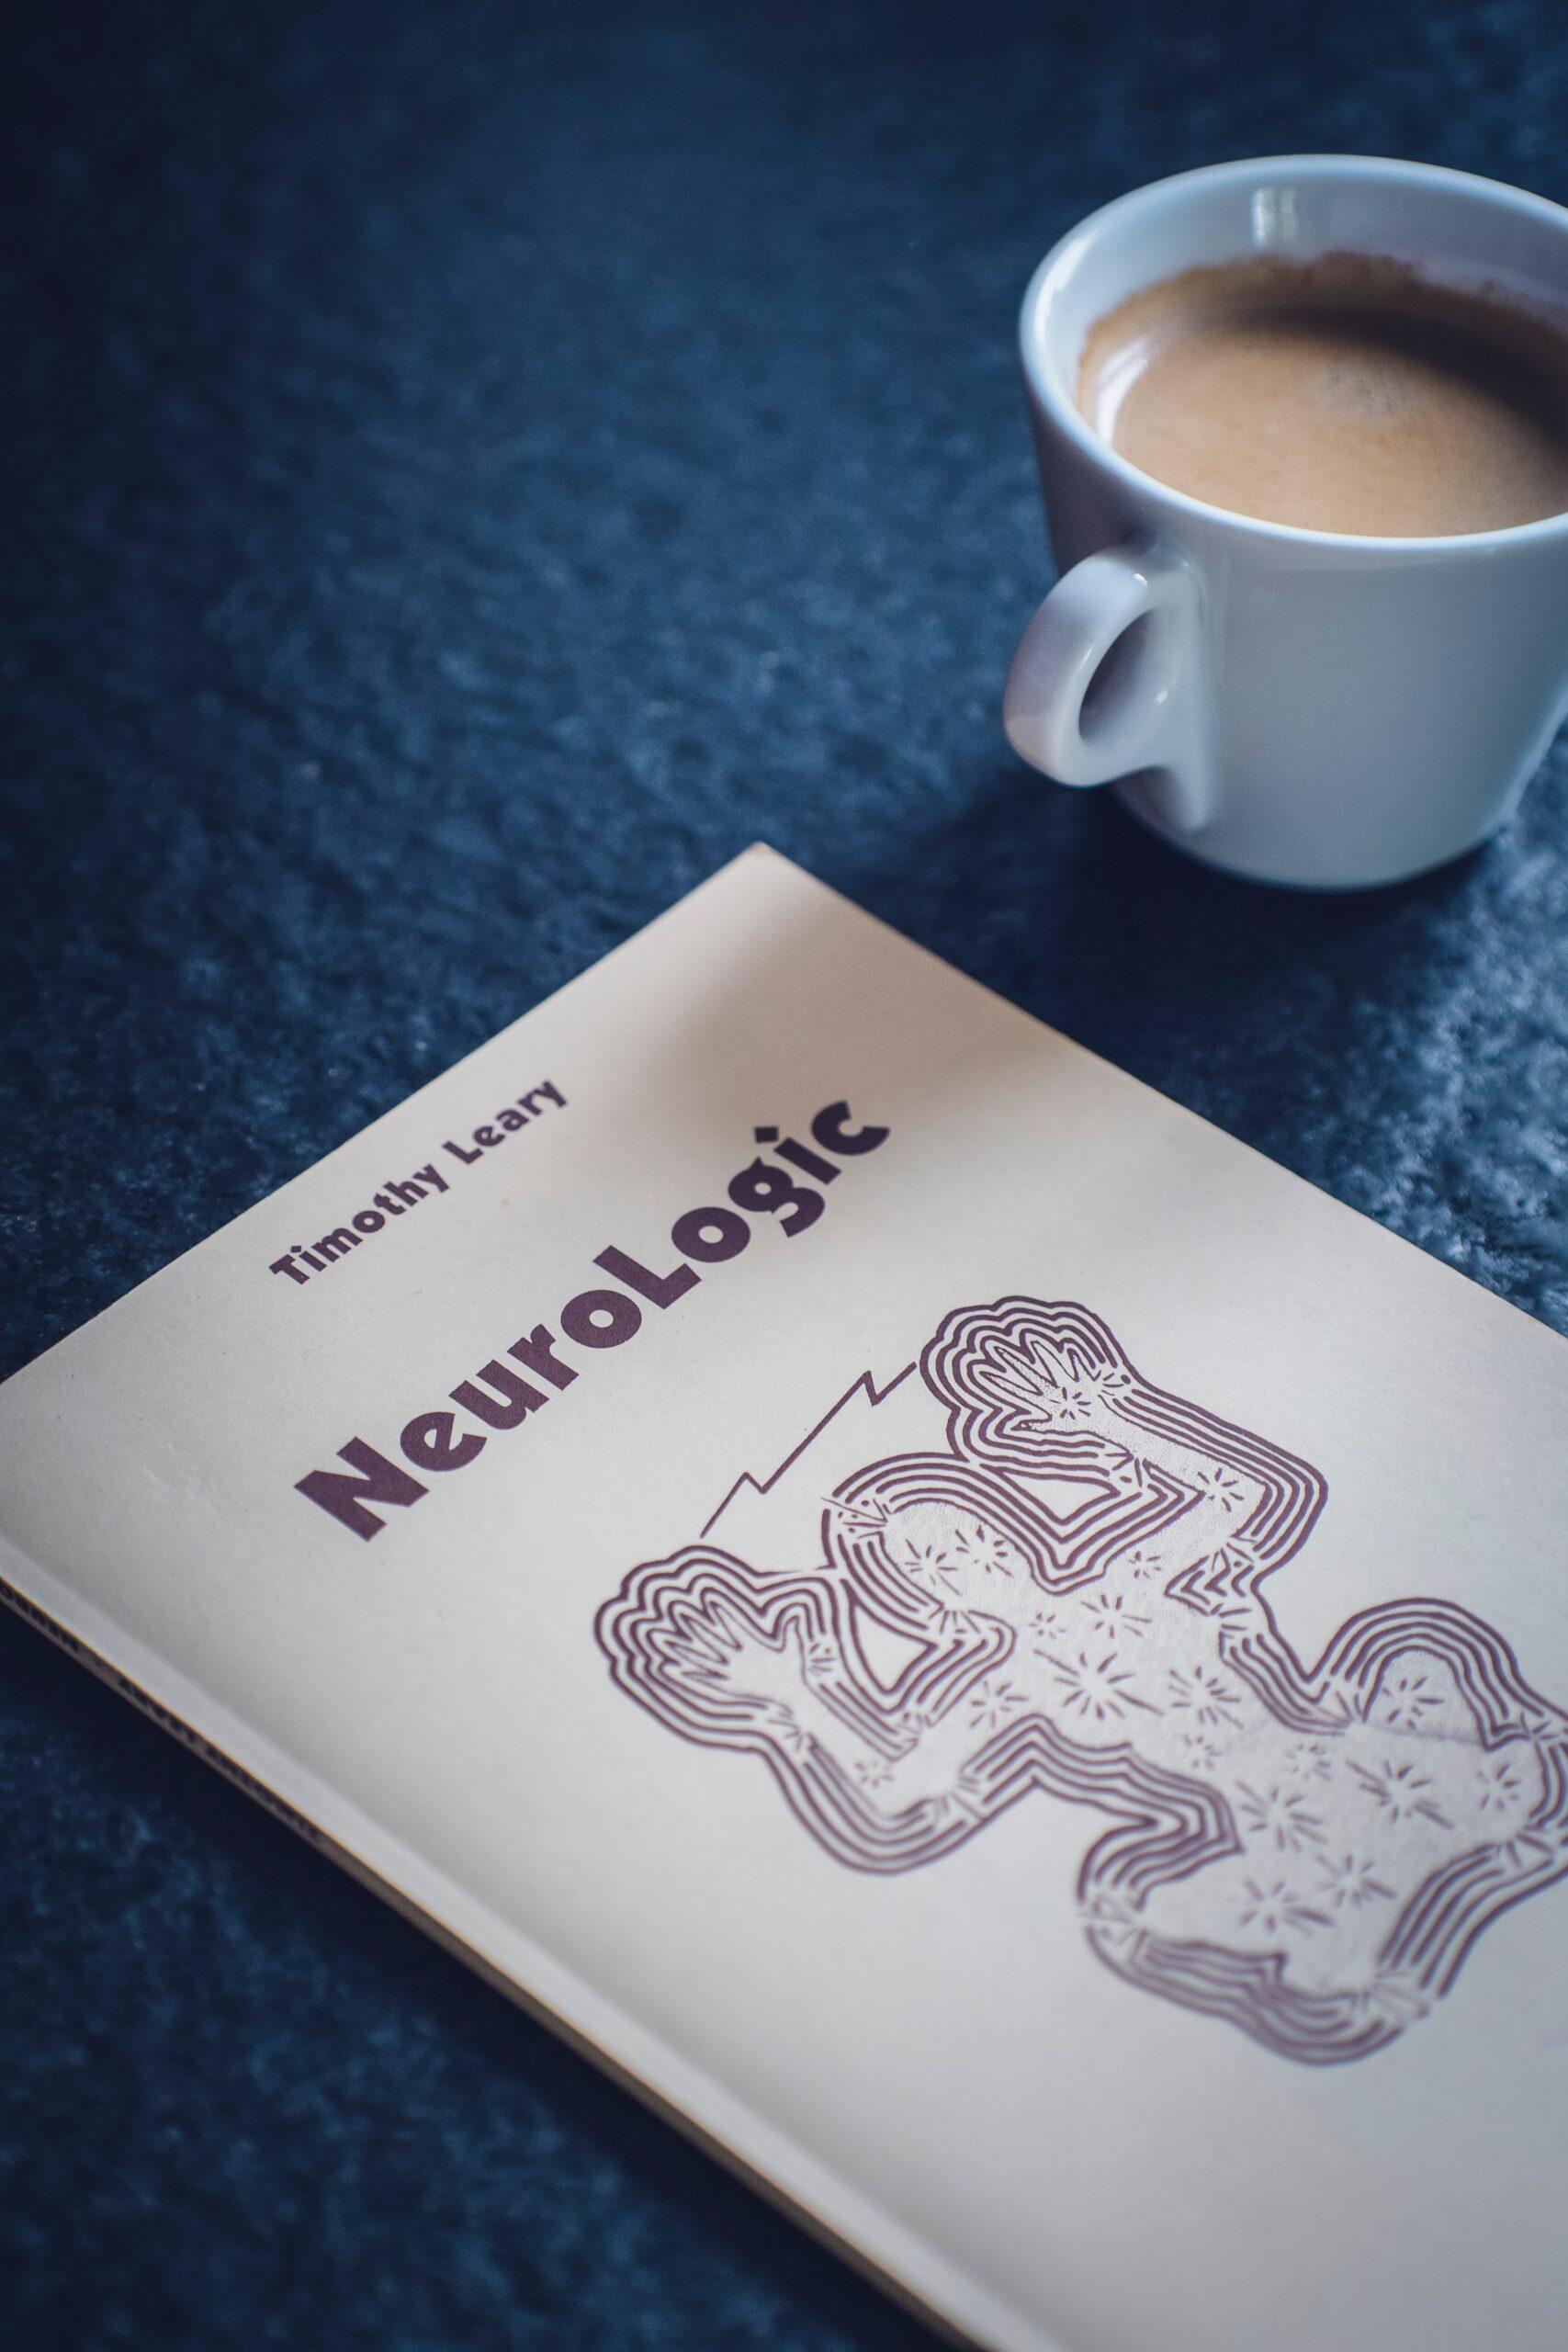 NeuroLogic book